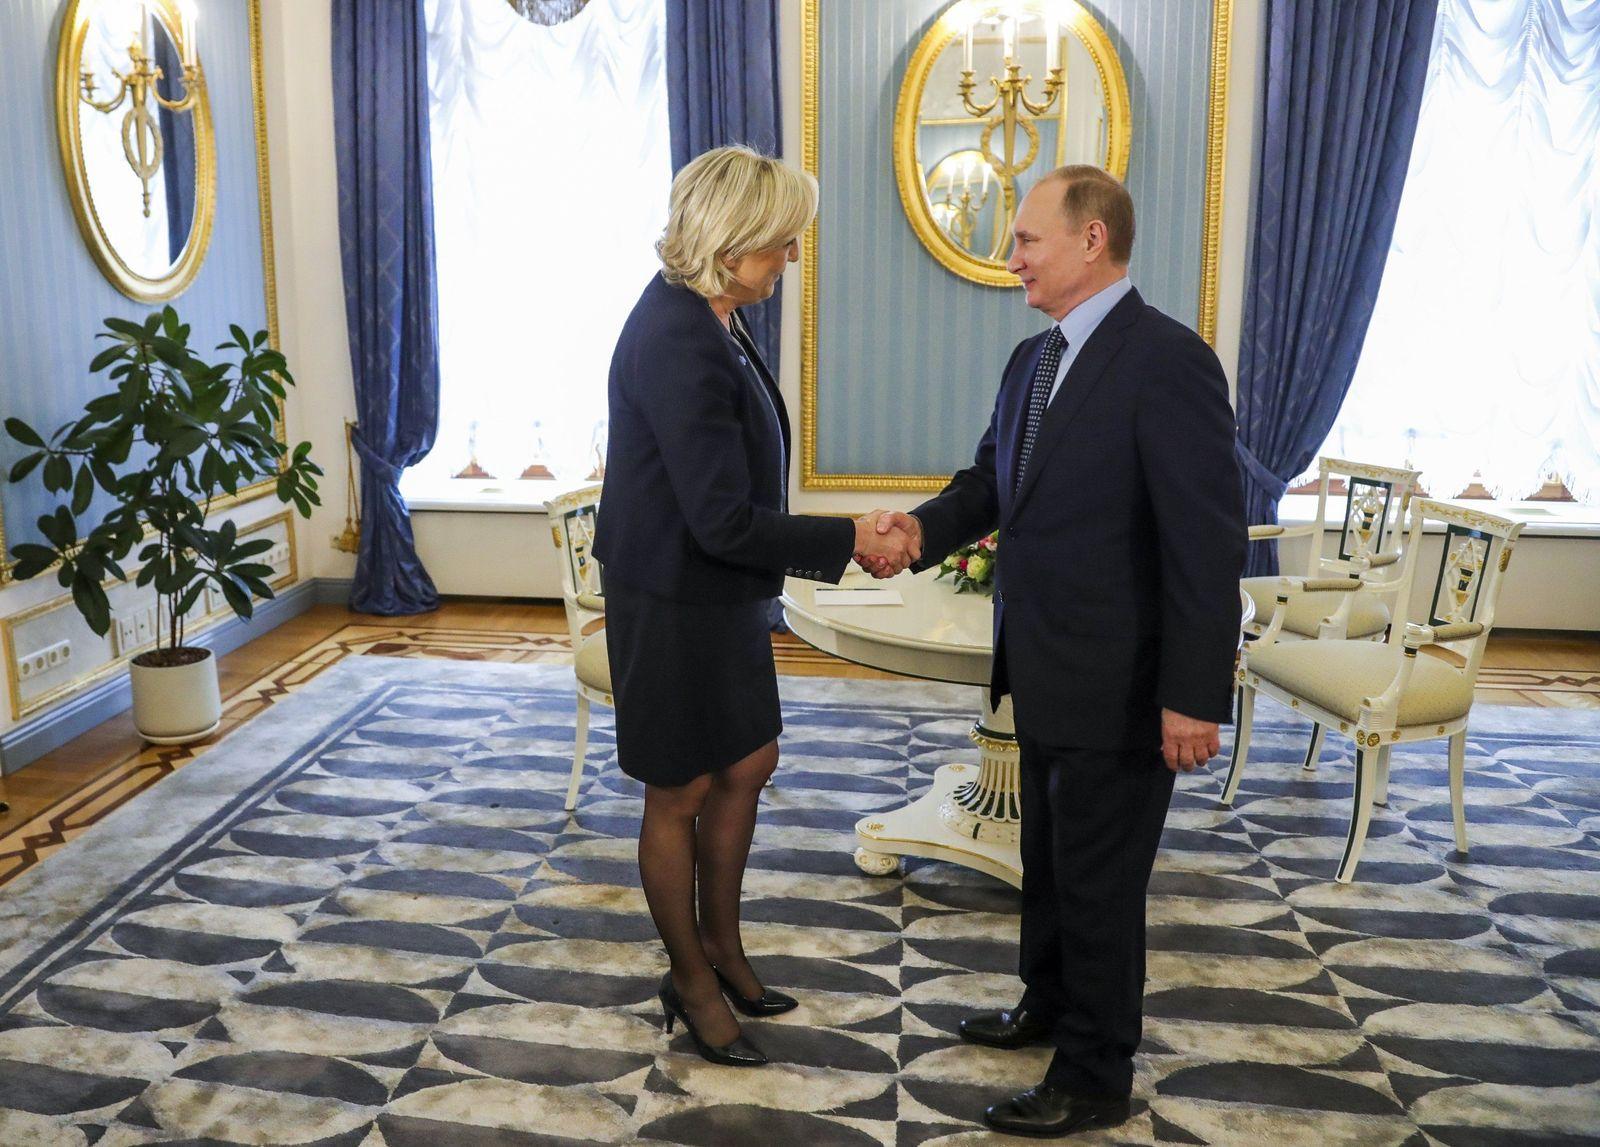 Le Pen / Wladimir Putin